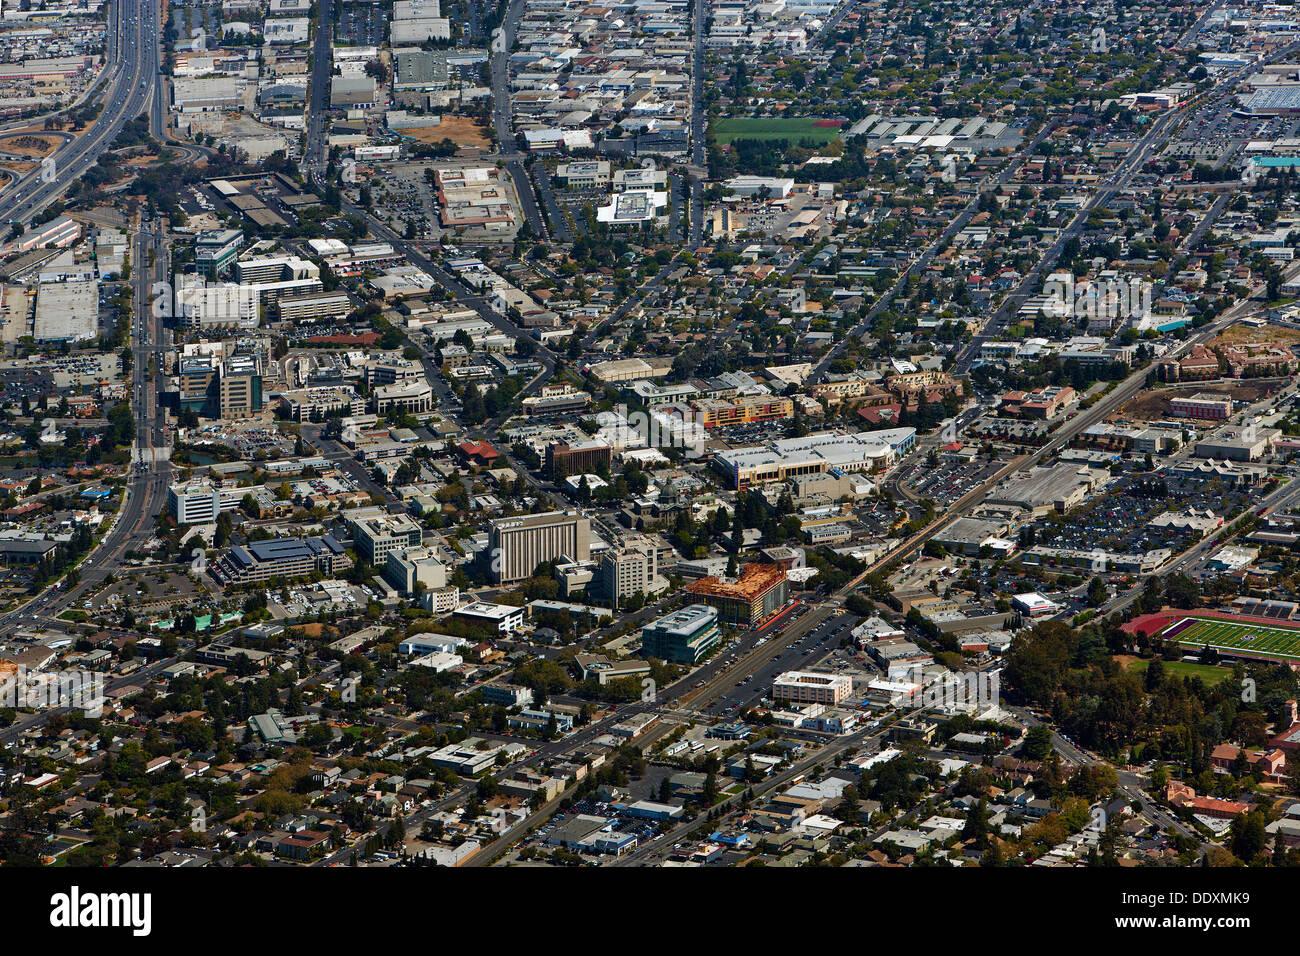 California san mateo county pescadero - Aerial Photograph Redwood City San Mateo County California Stock Image